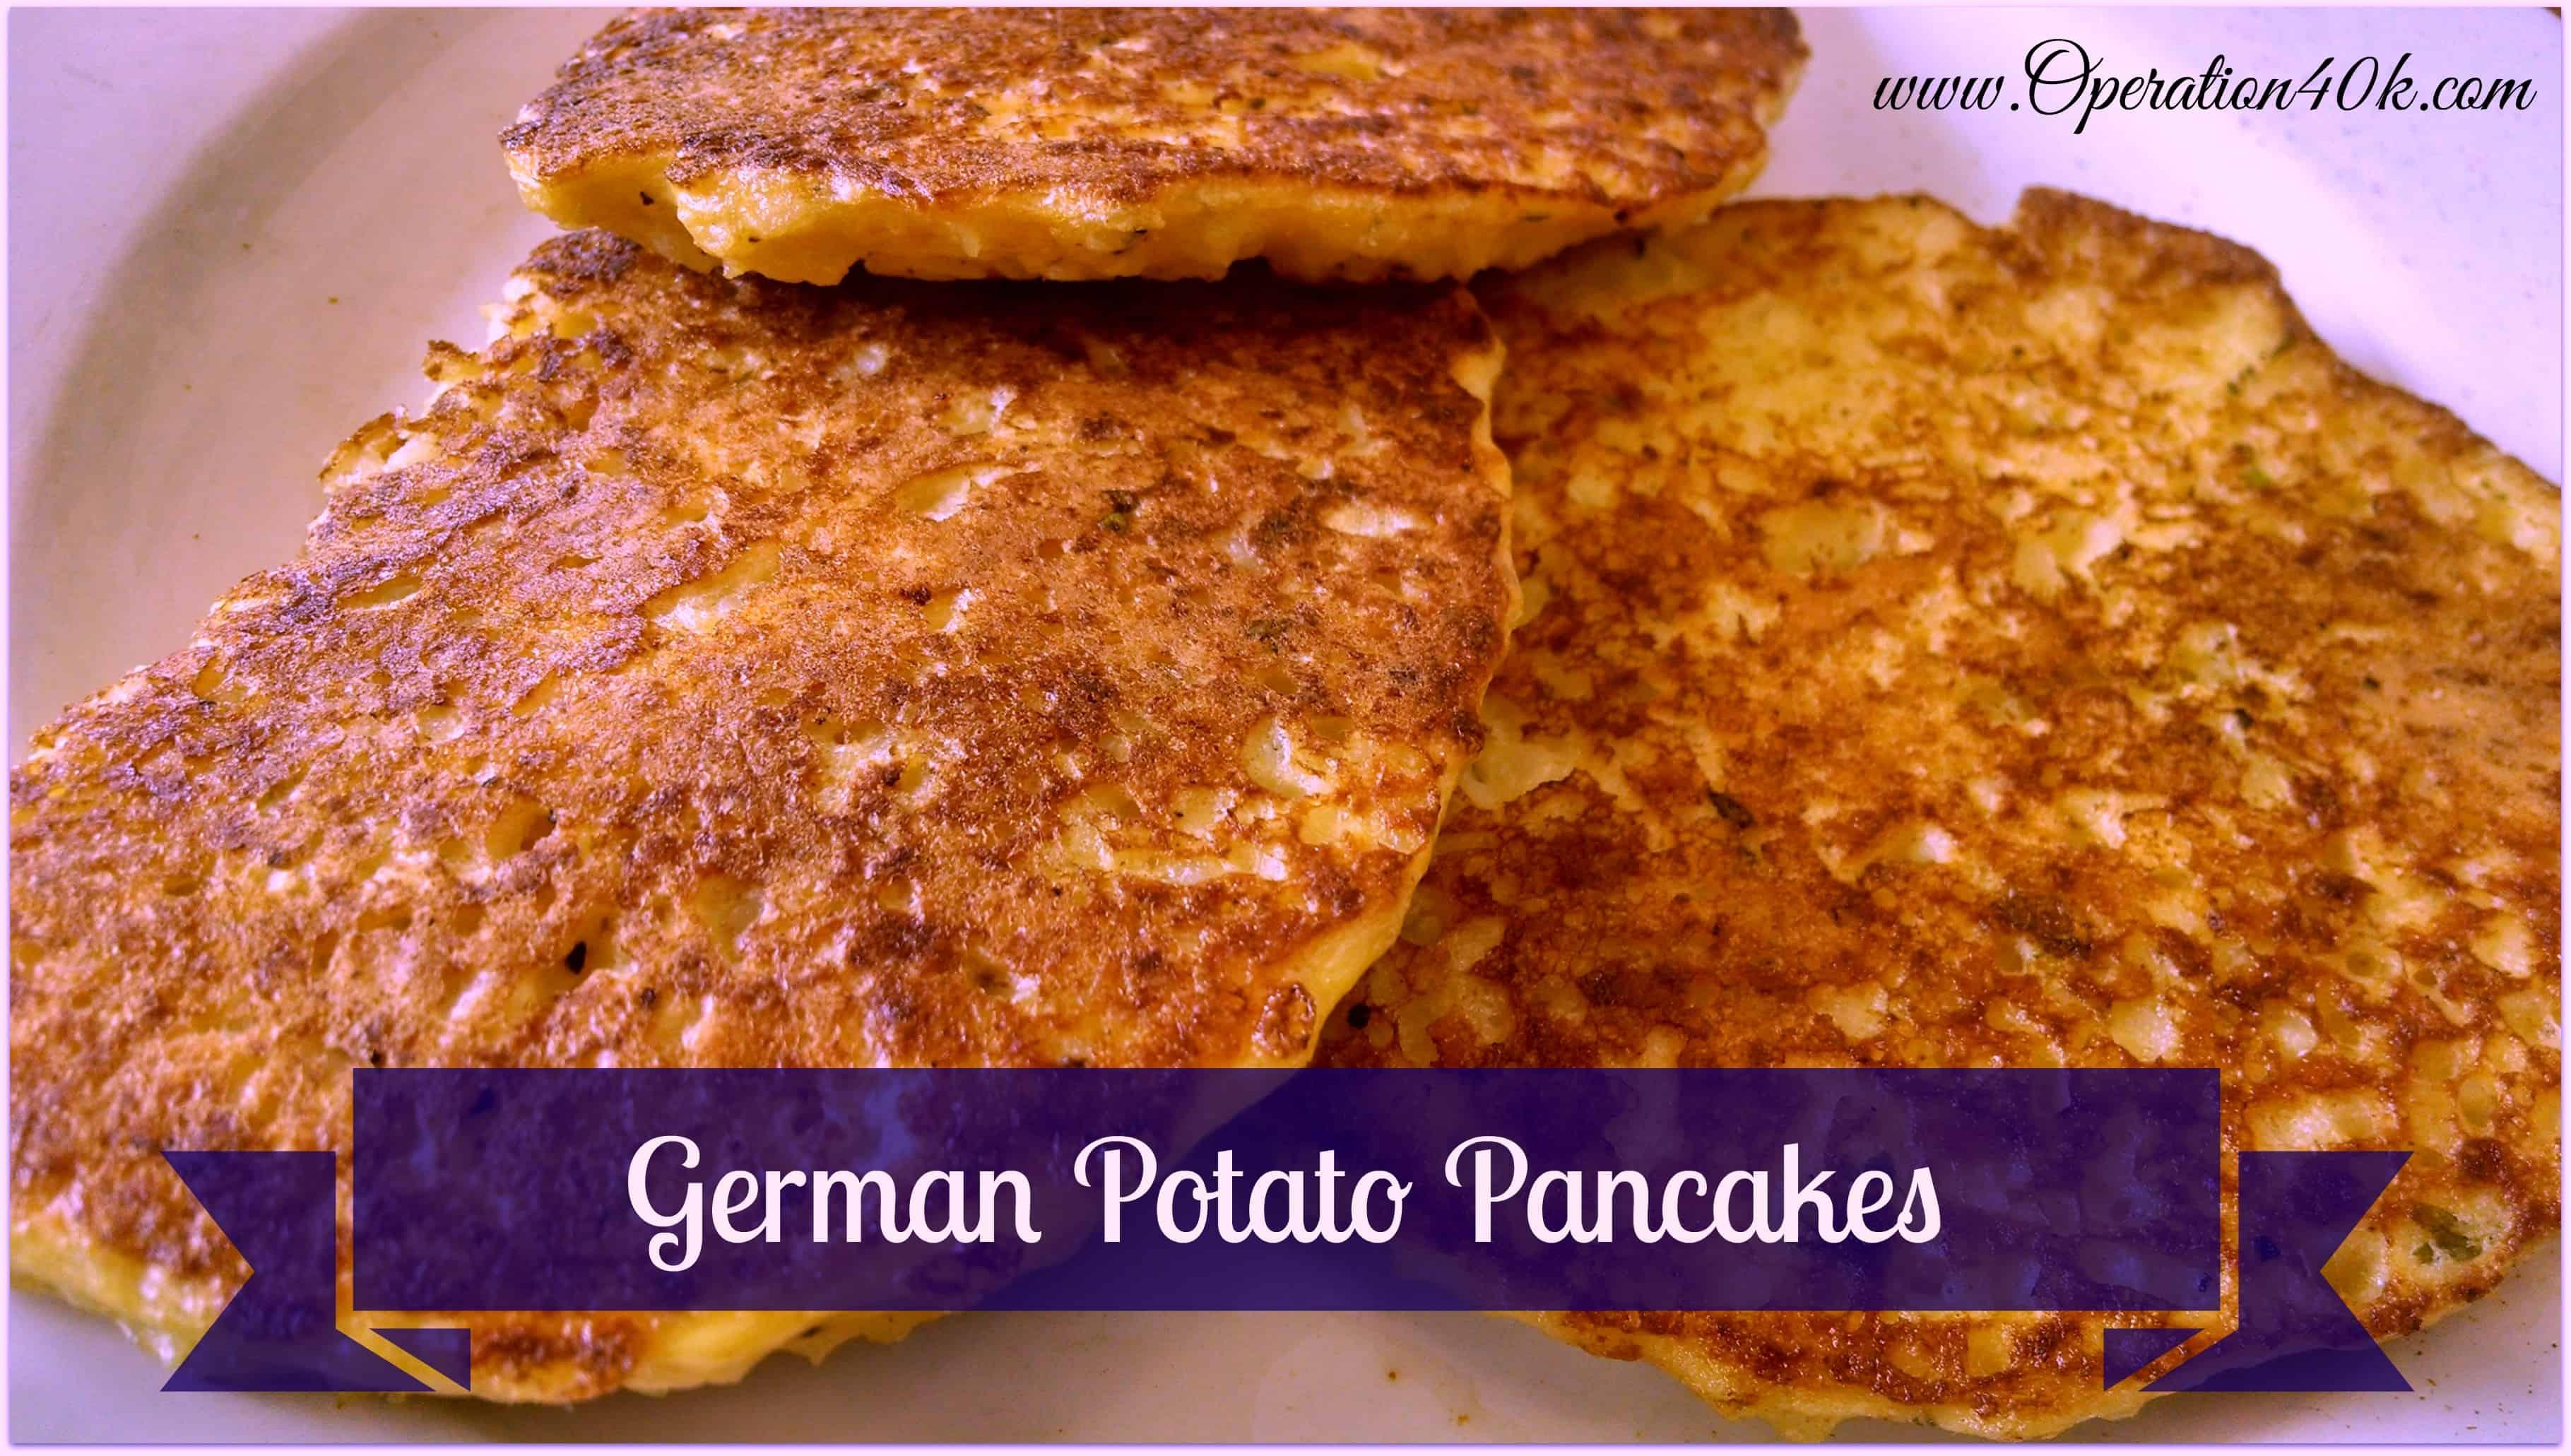 German potato pancakes recipes cake recipes online german potato pancakes recipes forumfinder Gallery